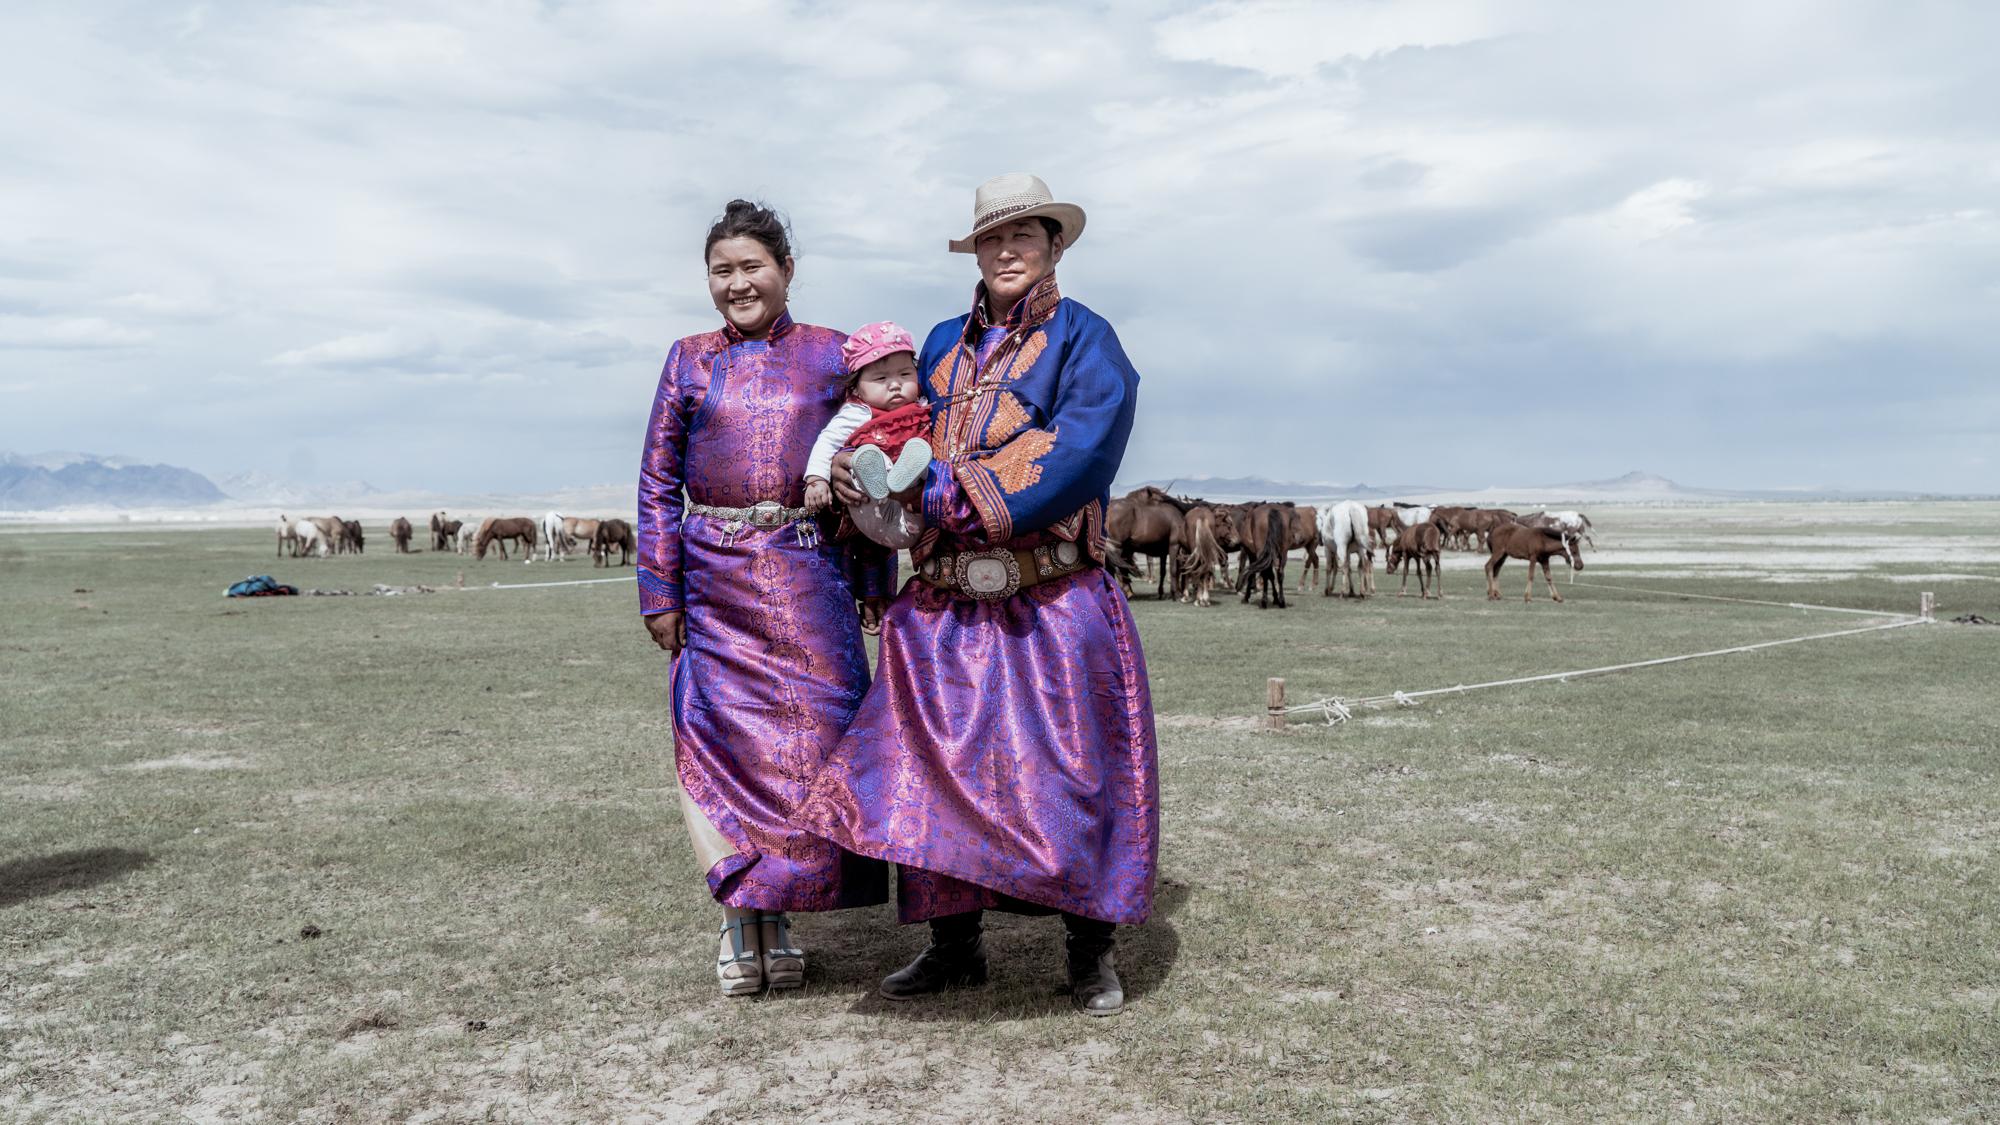 Mongolia 2017 Harry Fisch 2000sin título2017-06330.jpg